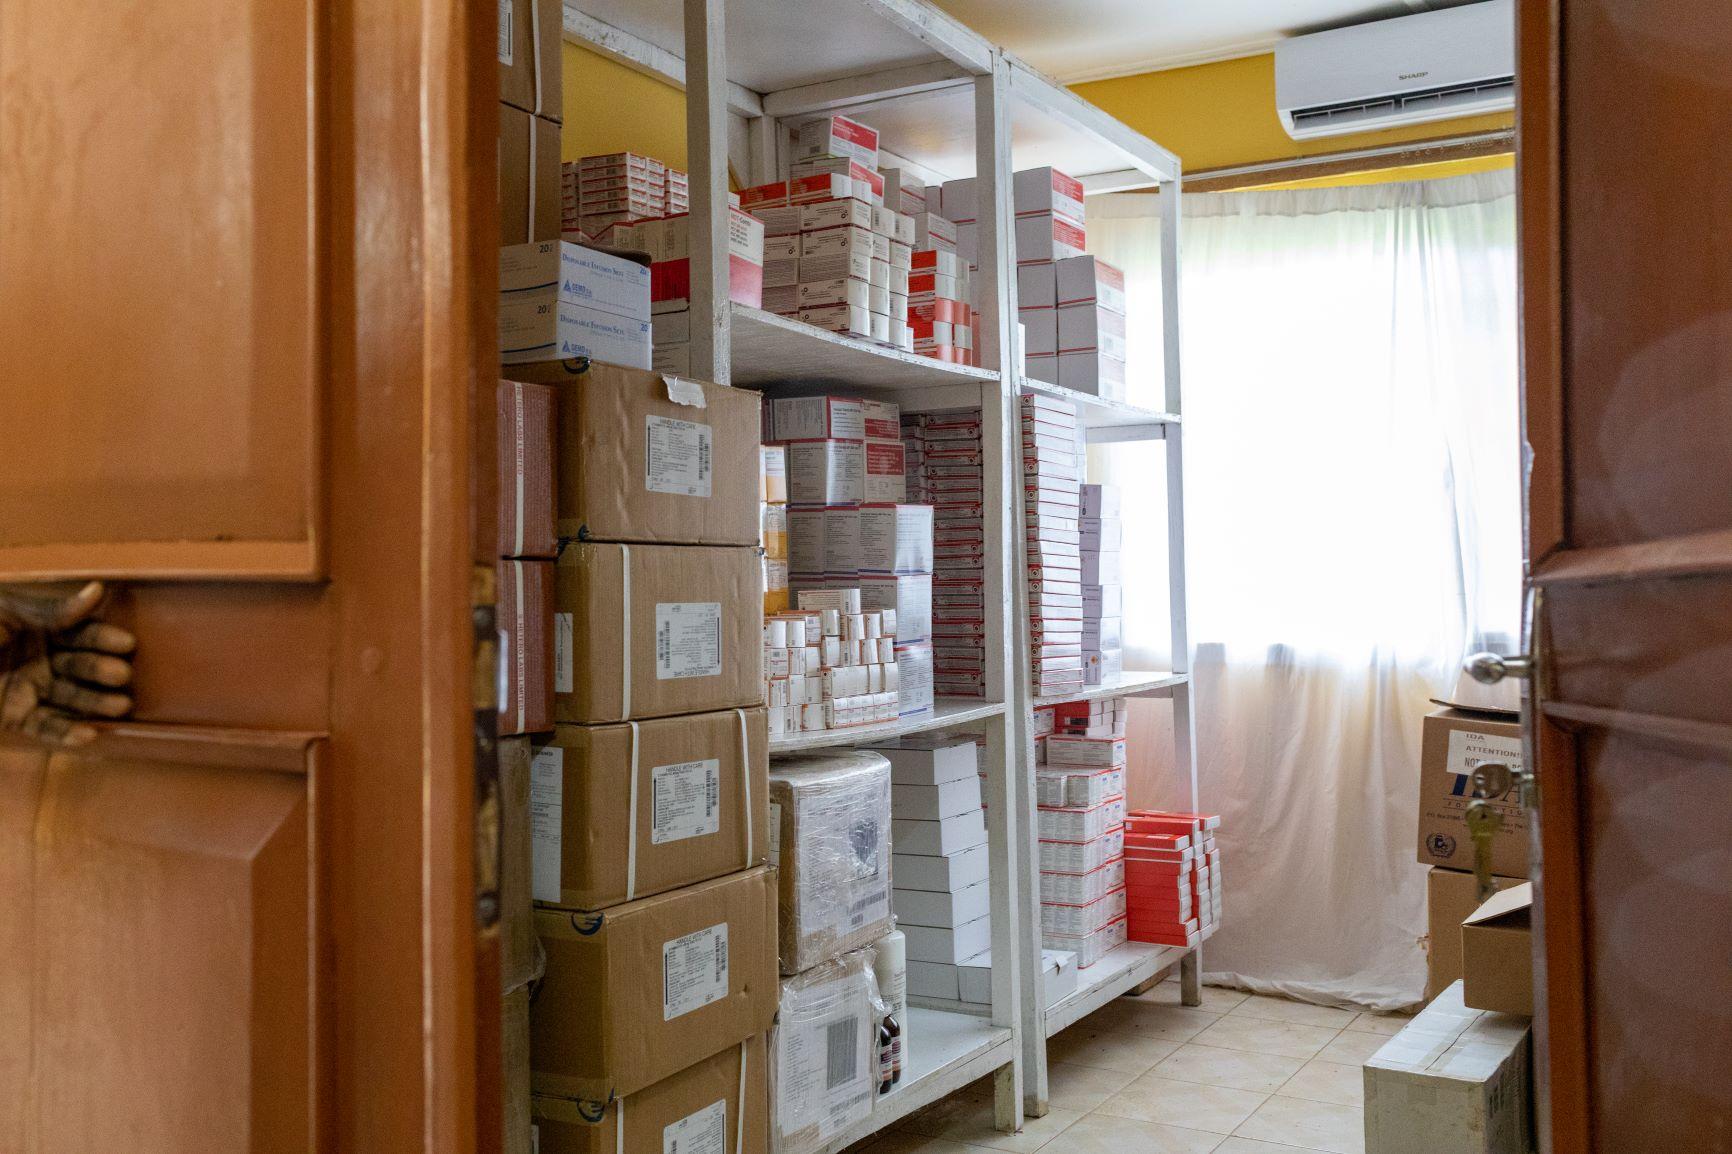 Well stocked shelves at the Lakka Hospital pharmacy